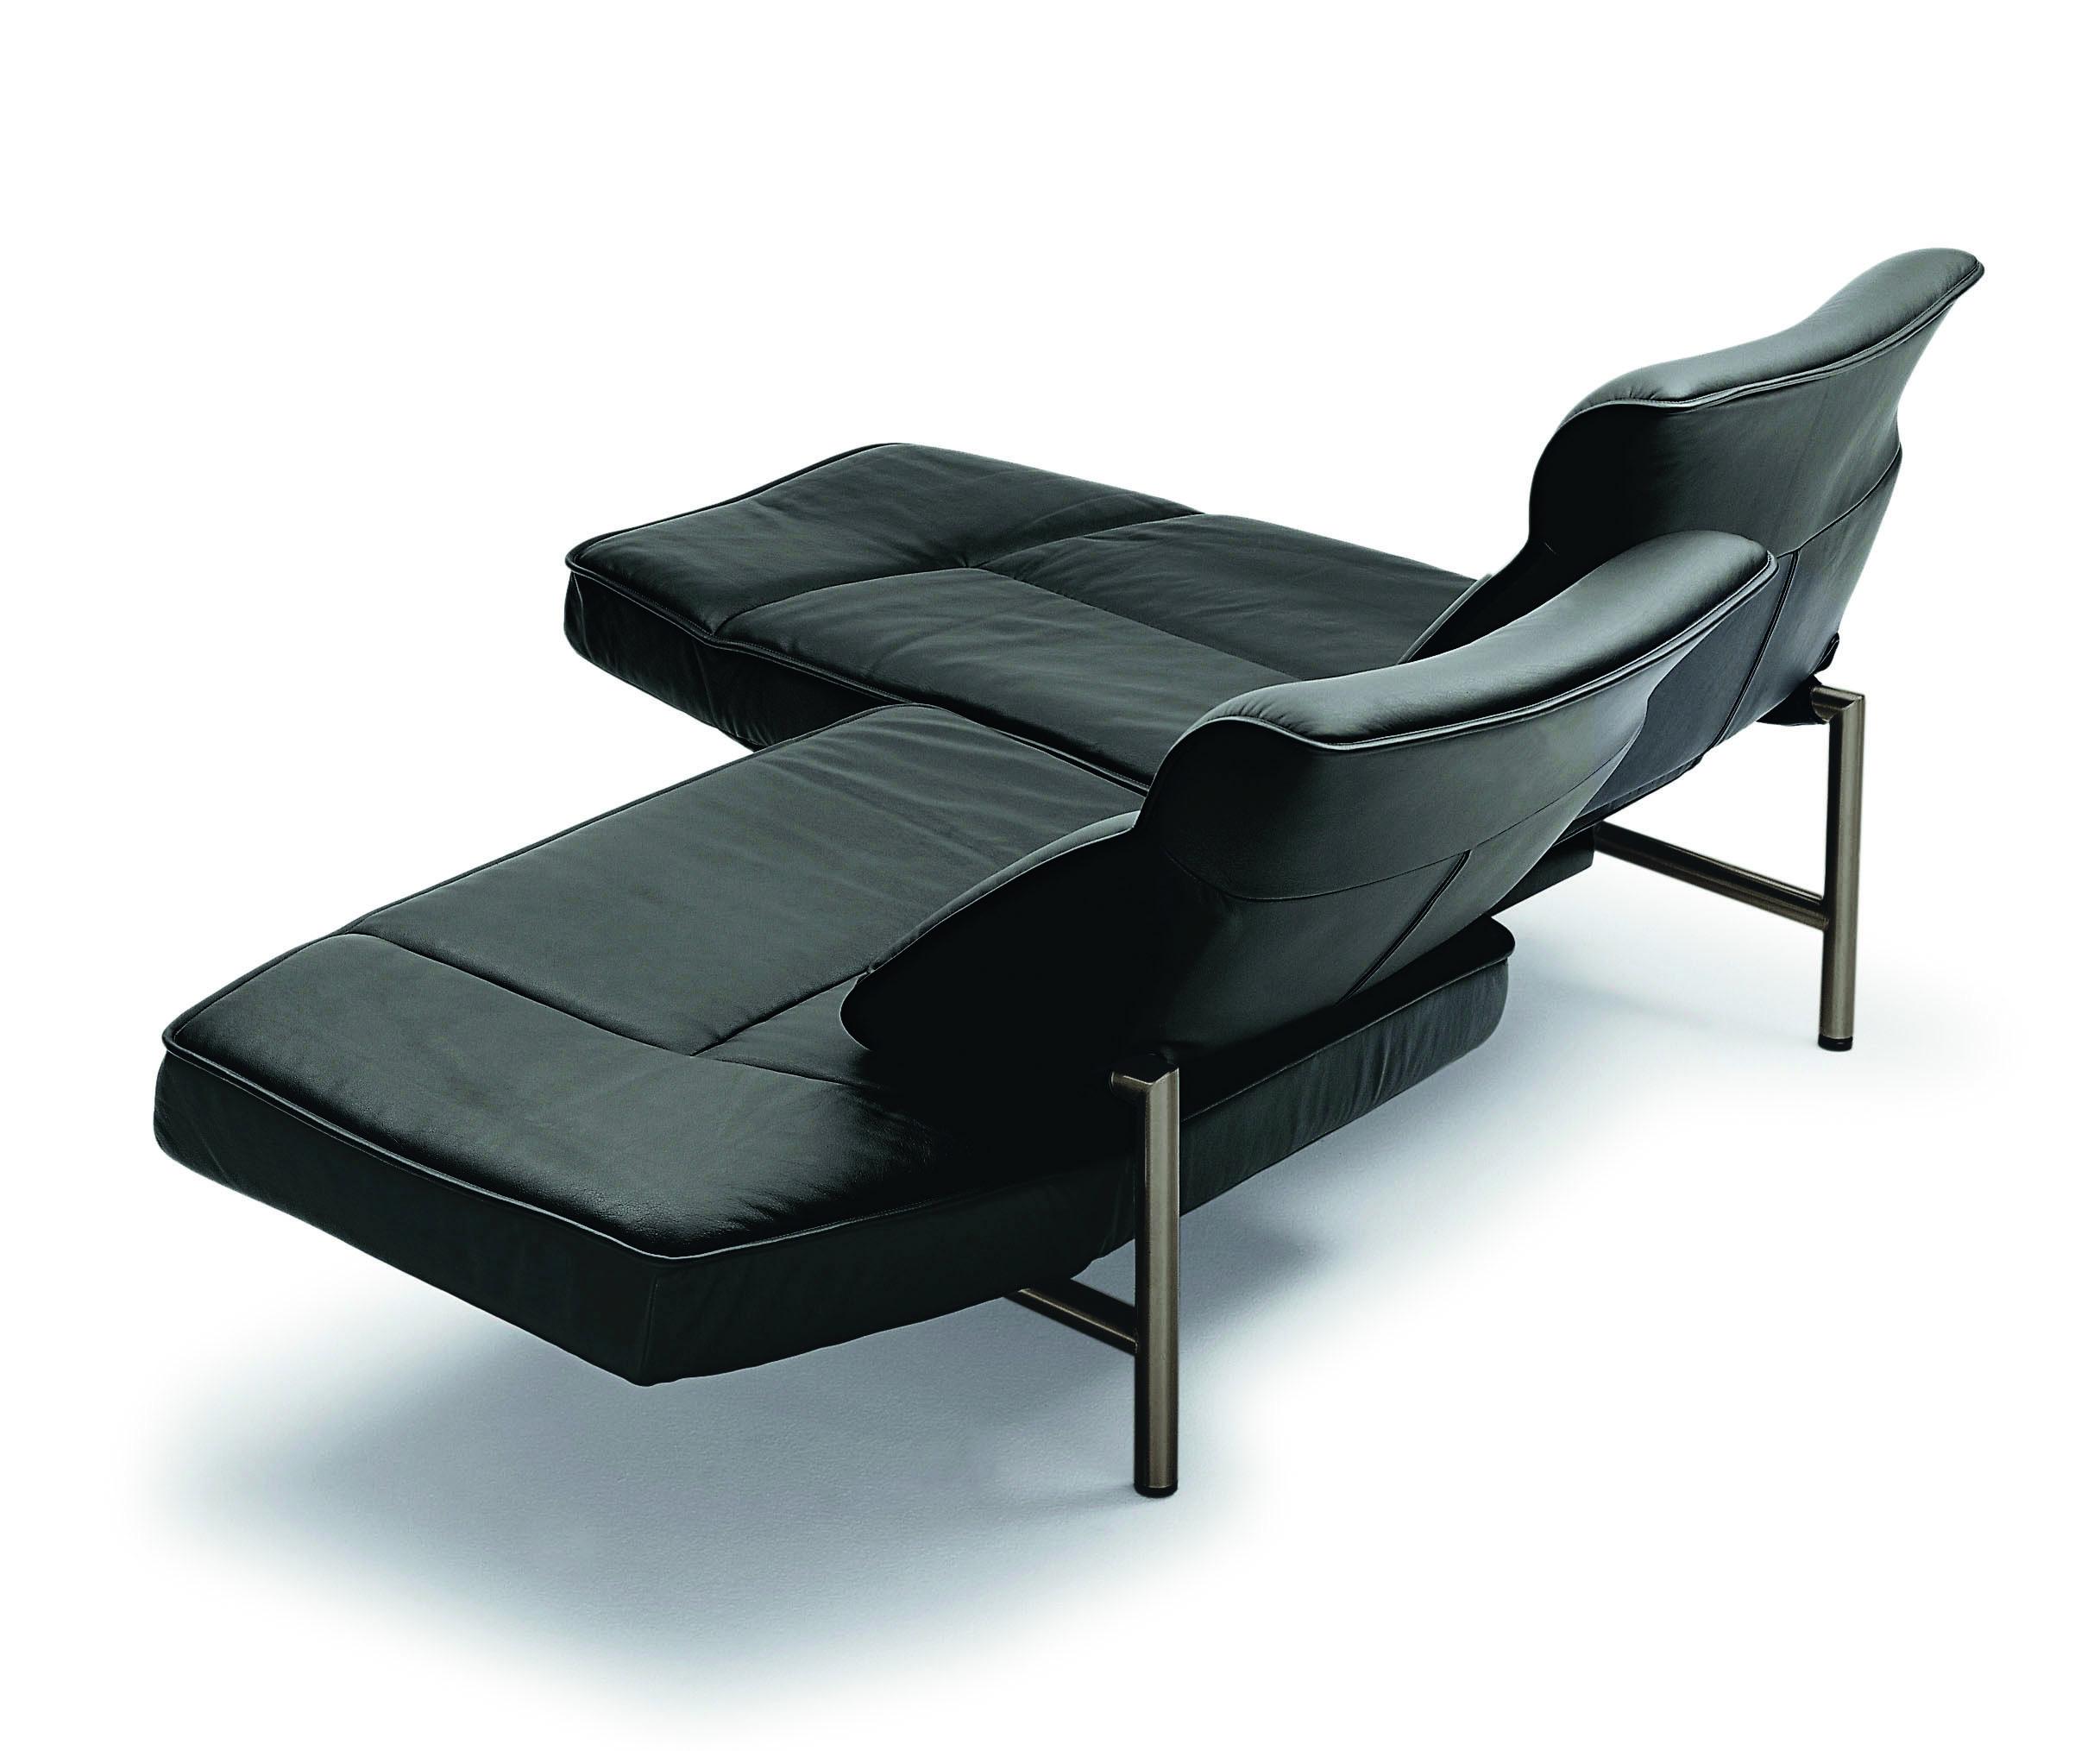 Full Size of De Sede Sofa Endless Ds 600 Bi Usa Gebraucht Kaufen Sleeper Bed Sessel For Sale Used Schweiz Deckenleuchte Schlafzimmer Modern Modernes Bett Wohnzimmer Sofa De Sede Sofa